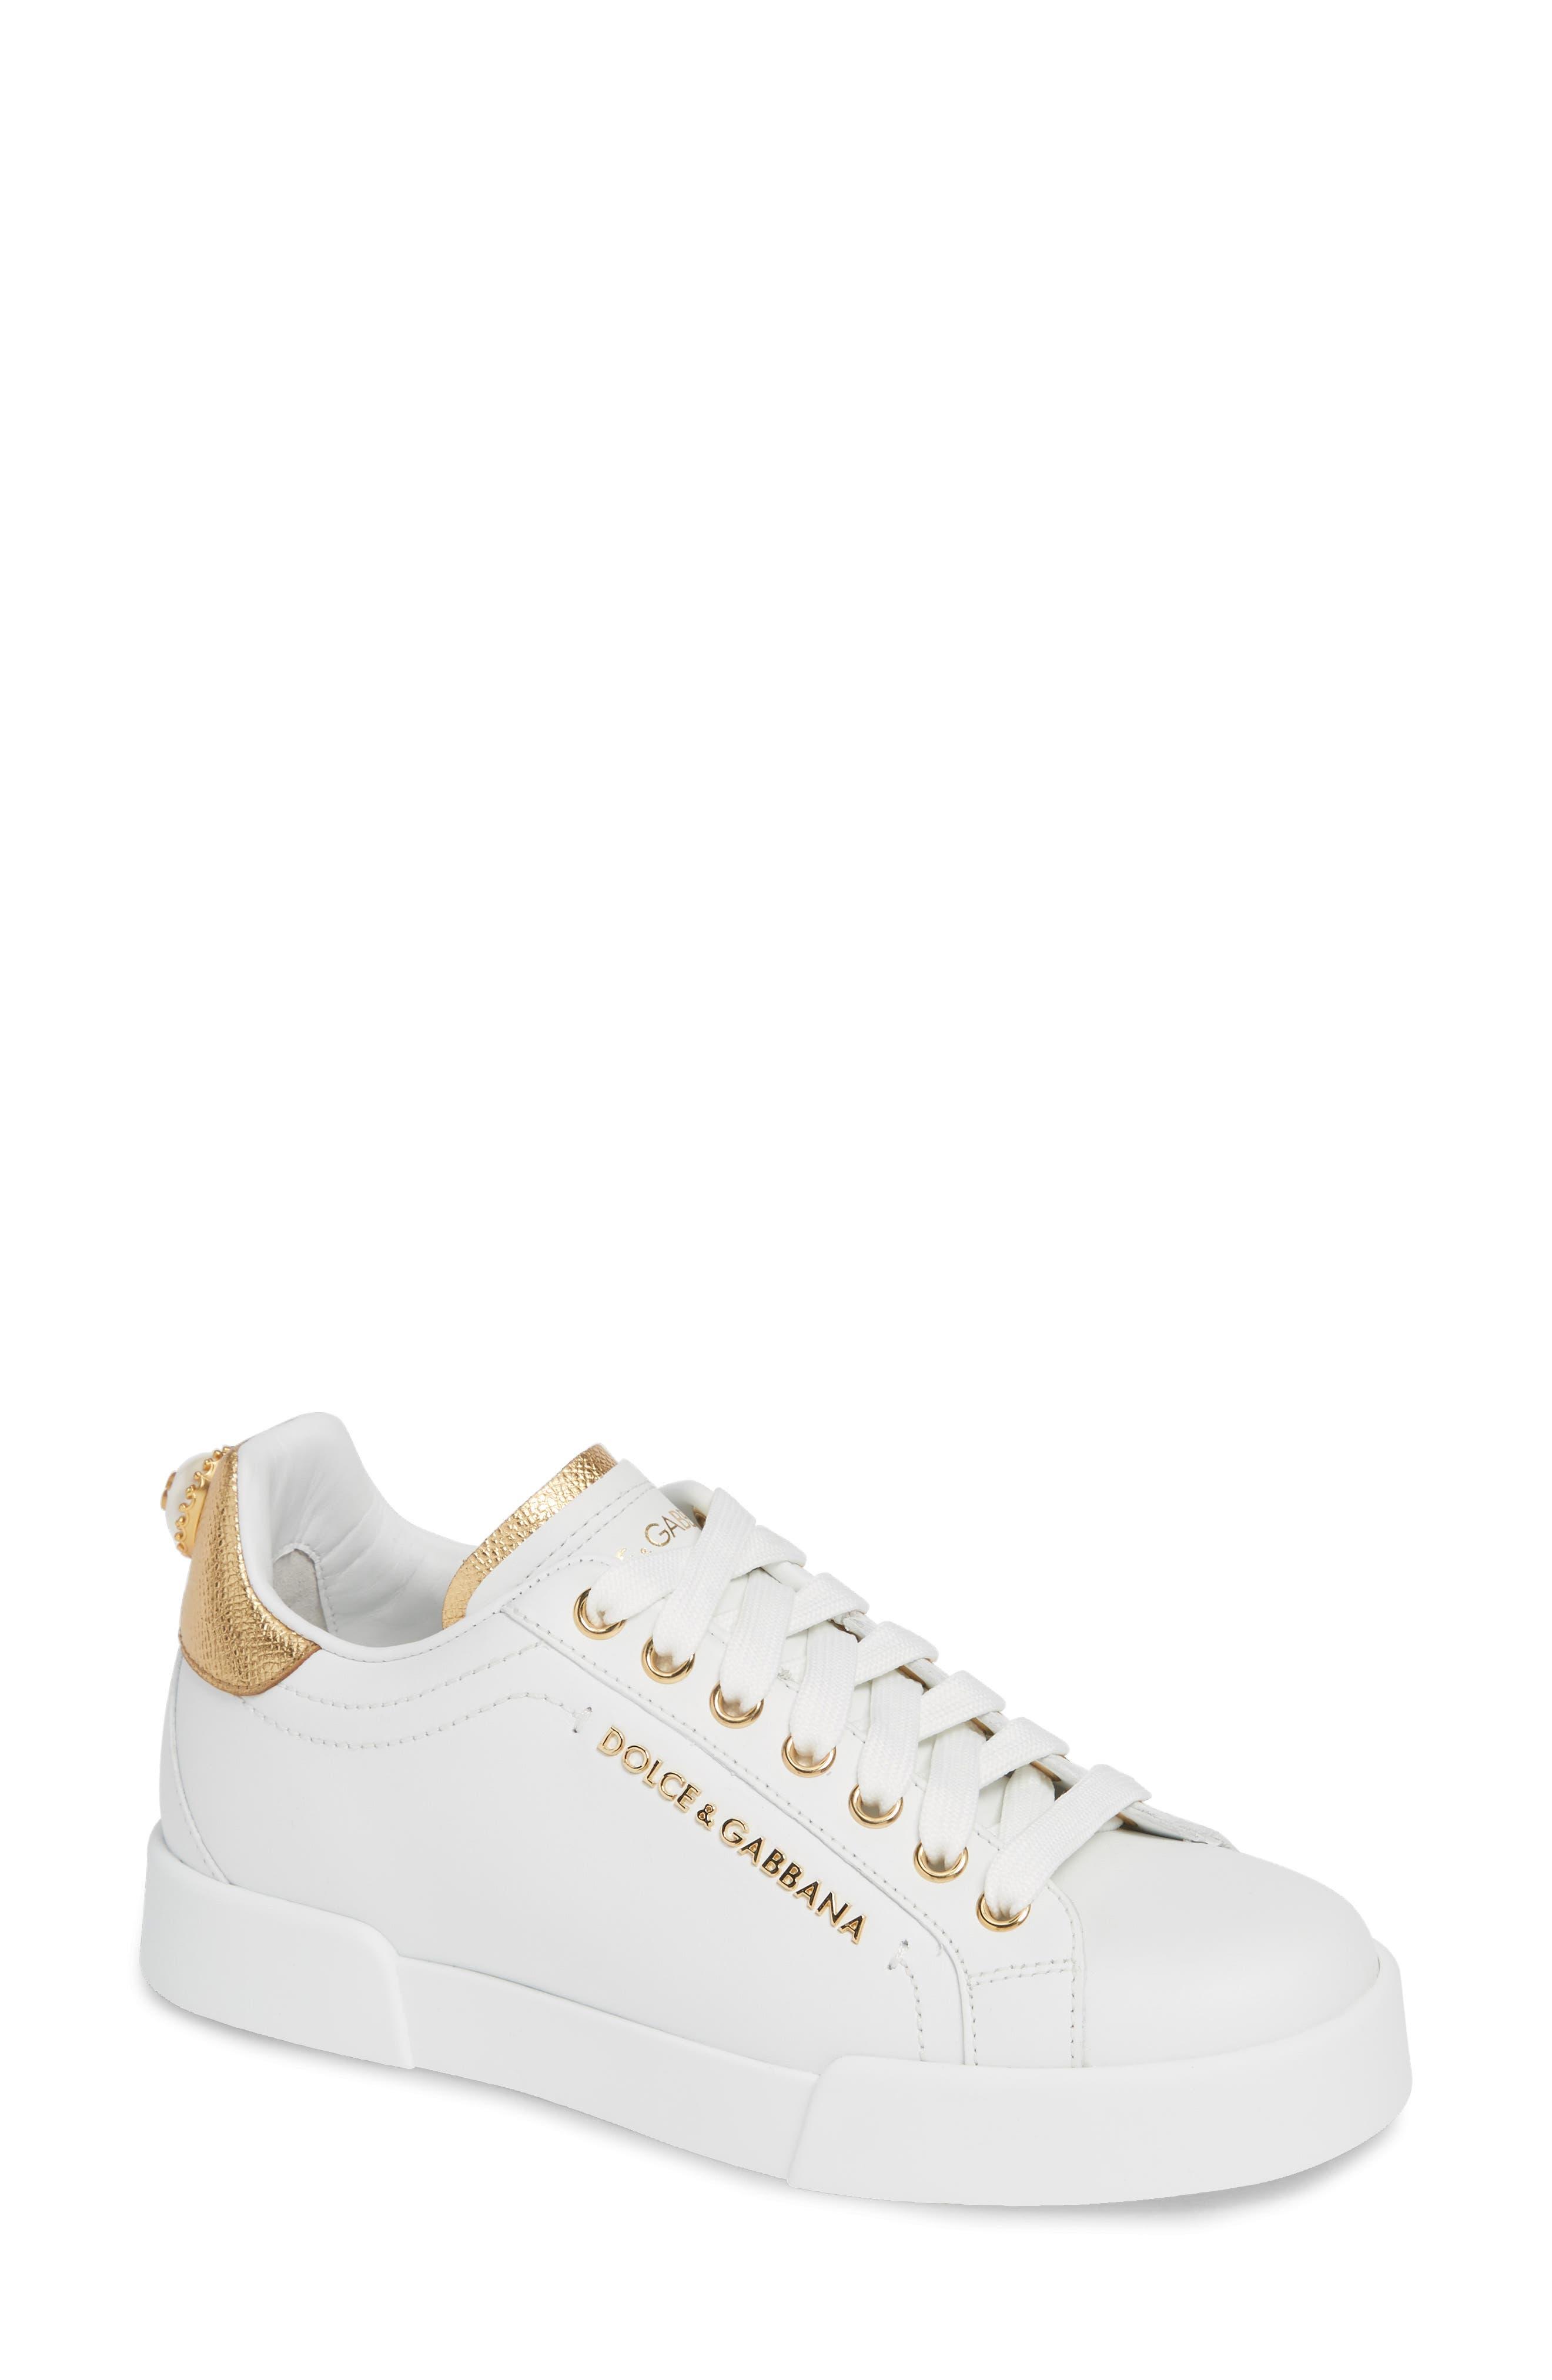 DOLCE&GABBANA Portofino Embellished Sneaker, Main, color, WHITE/ GOLD